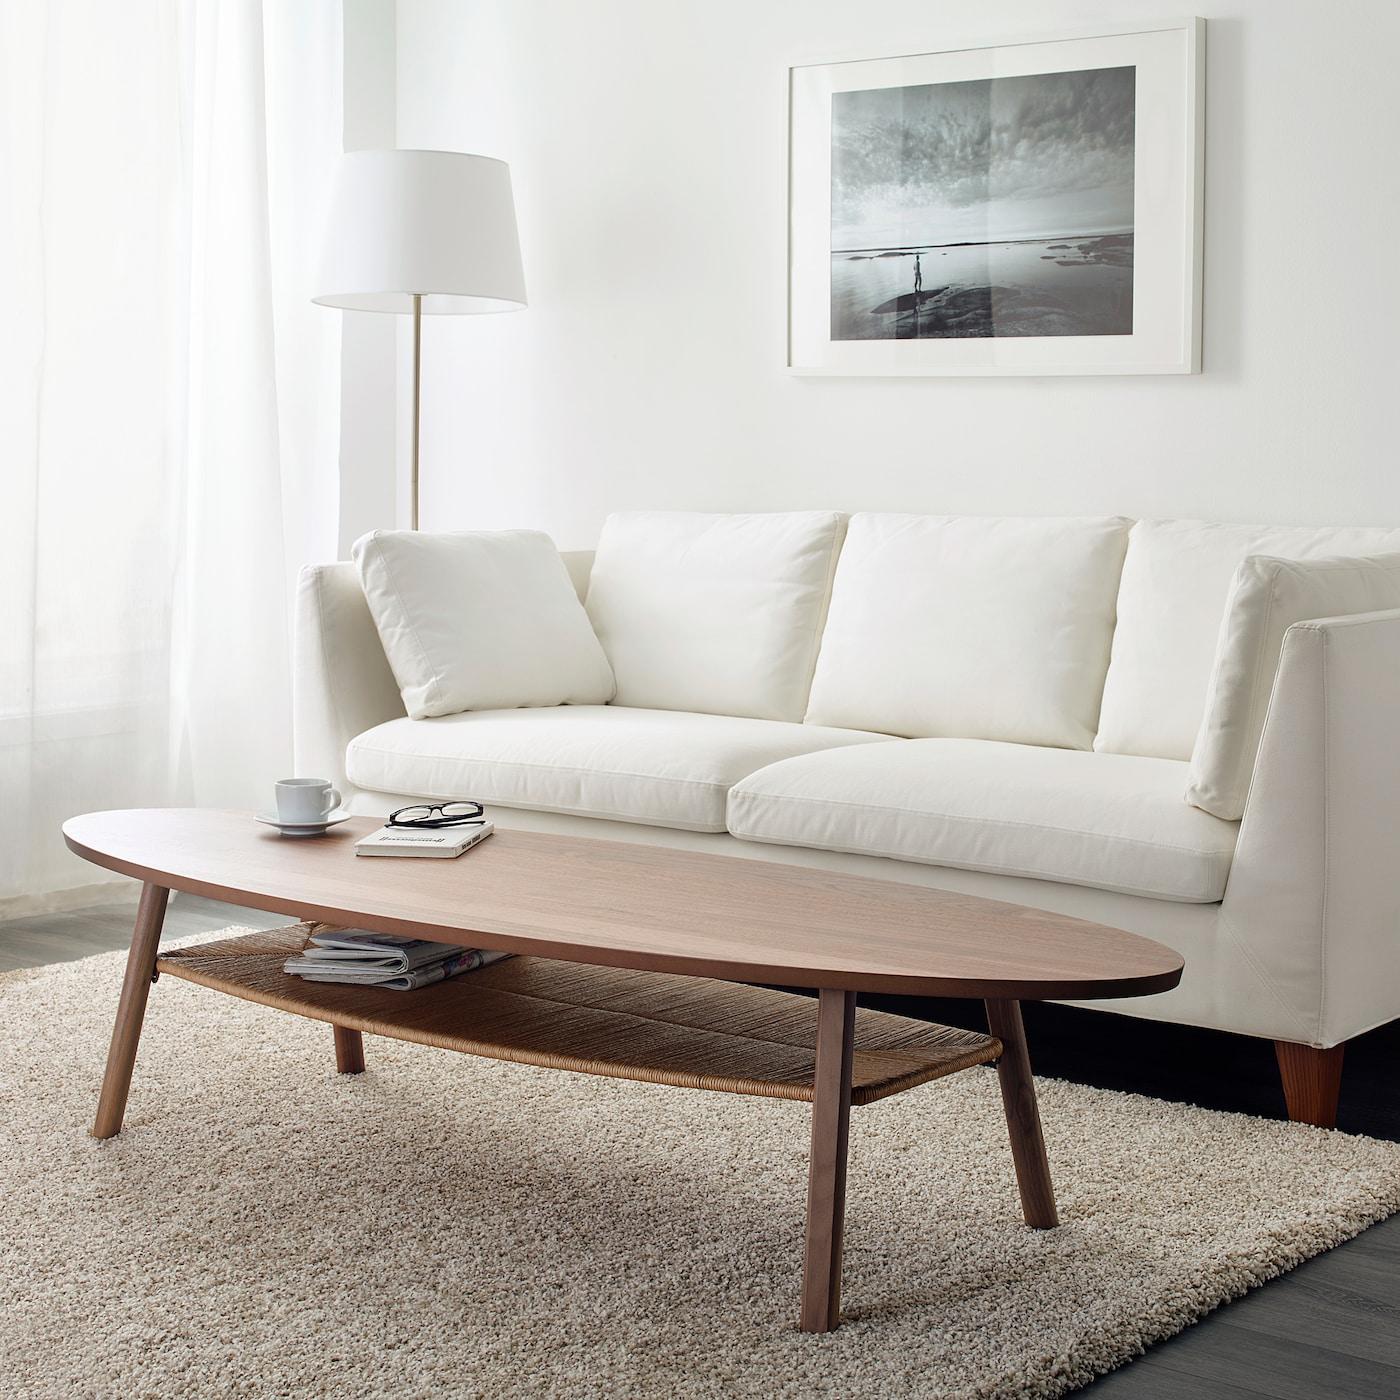 Stockholm Walnut Veneer Coffee Table 180x59 Cm Ikea